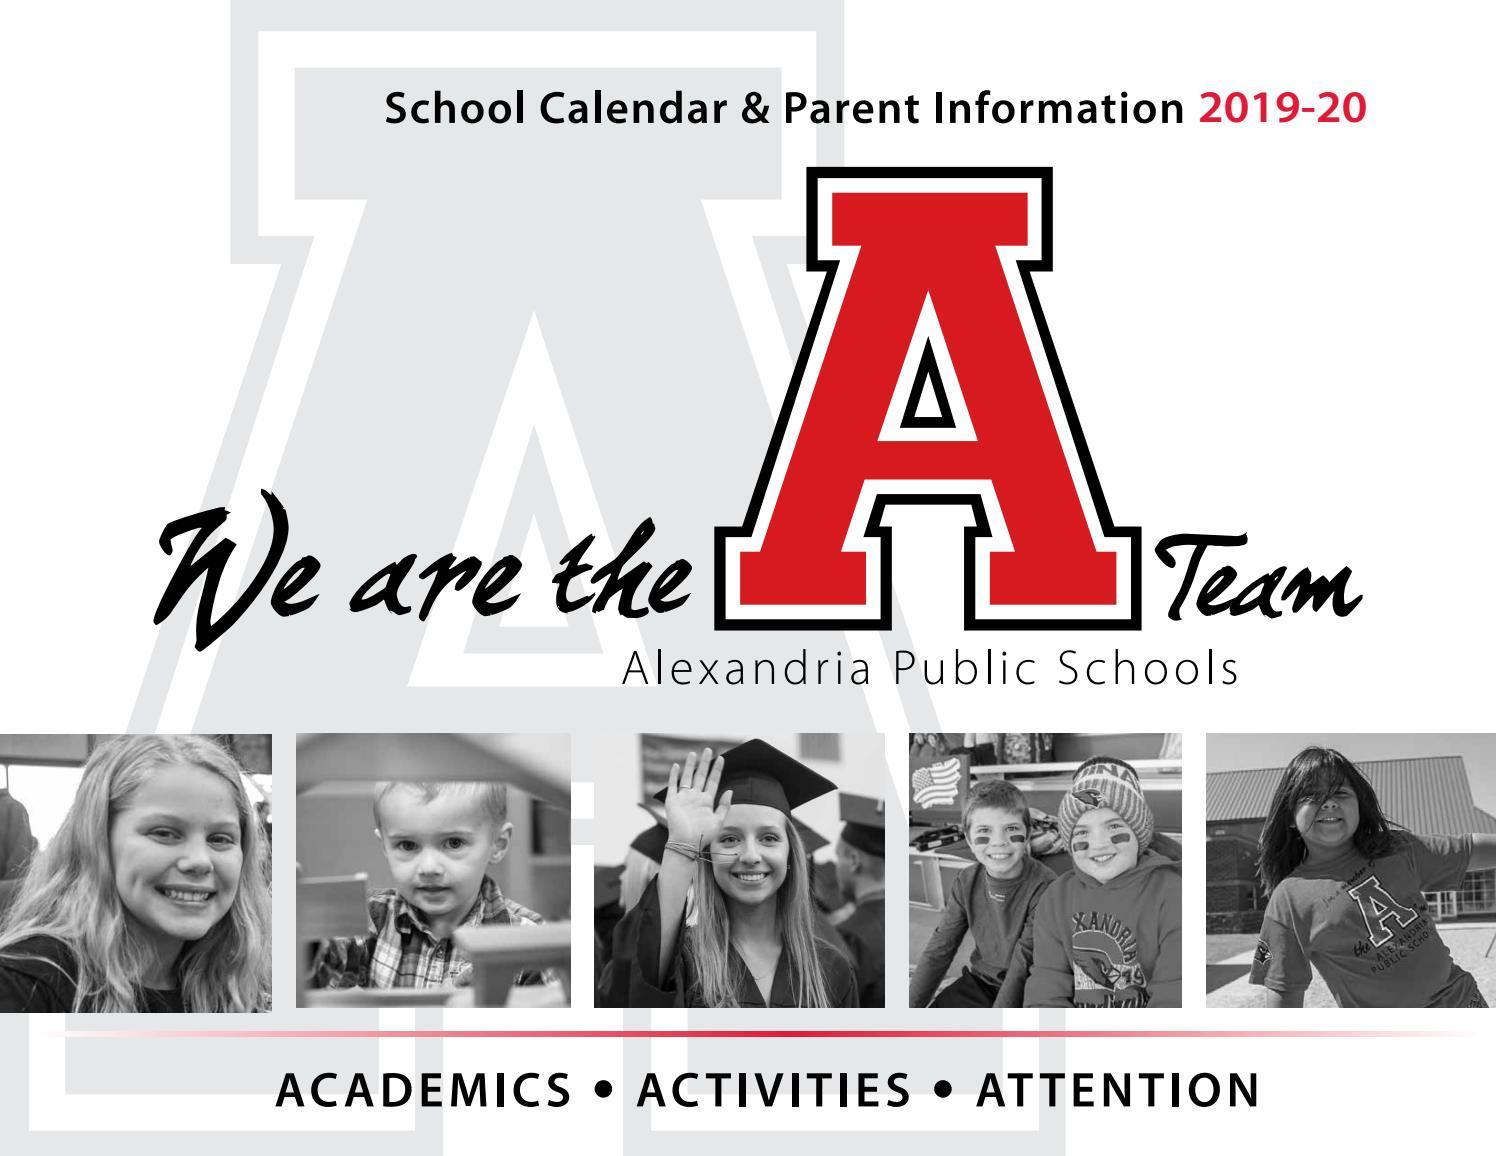 2019 20 School Calendaralexandria Public Schools – Issuu In Grand Rapids High School Calendar